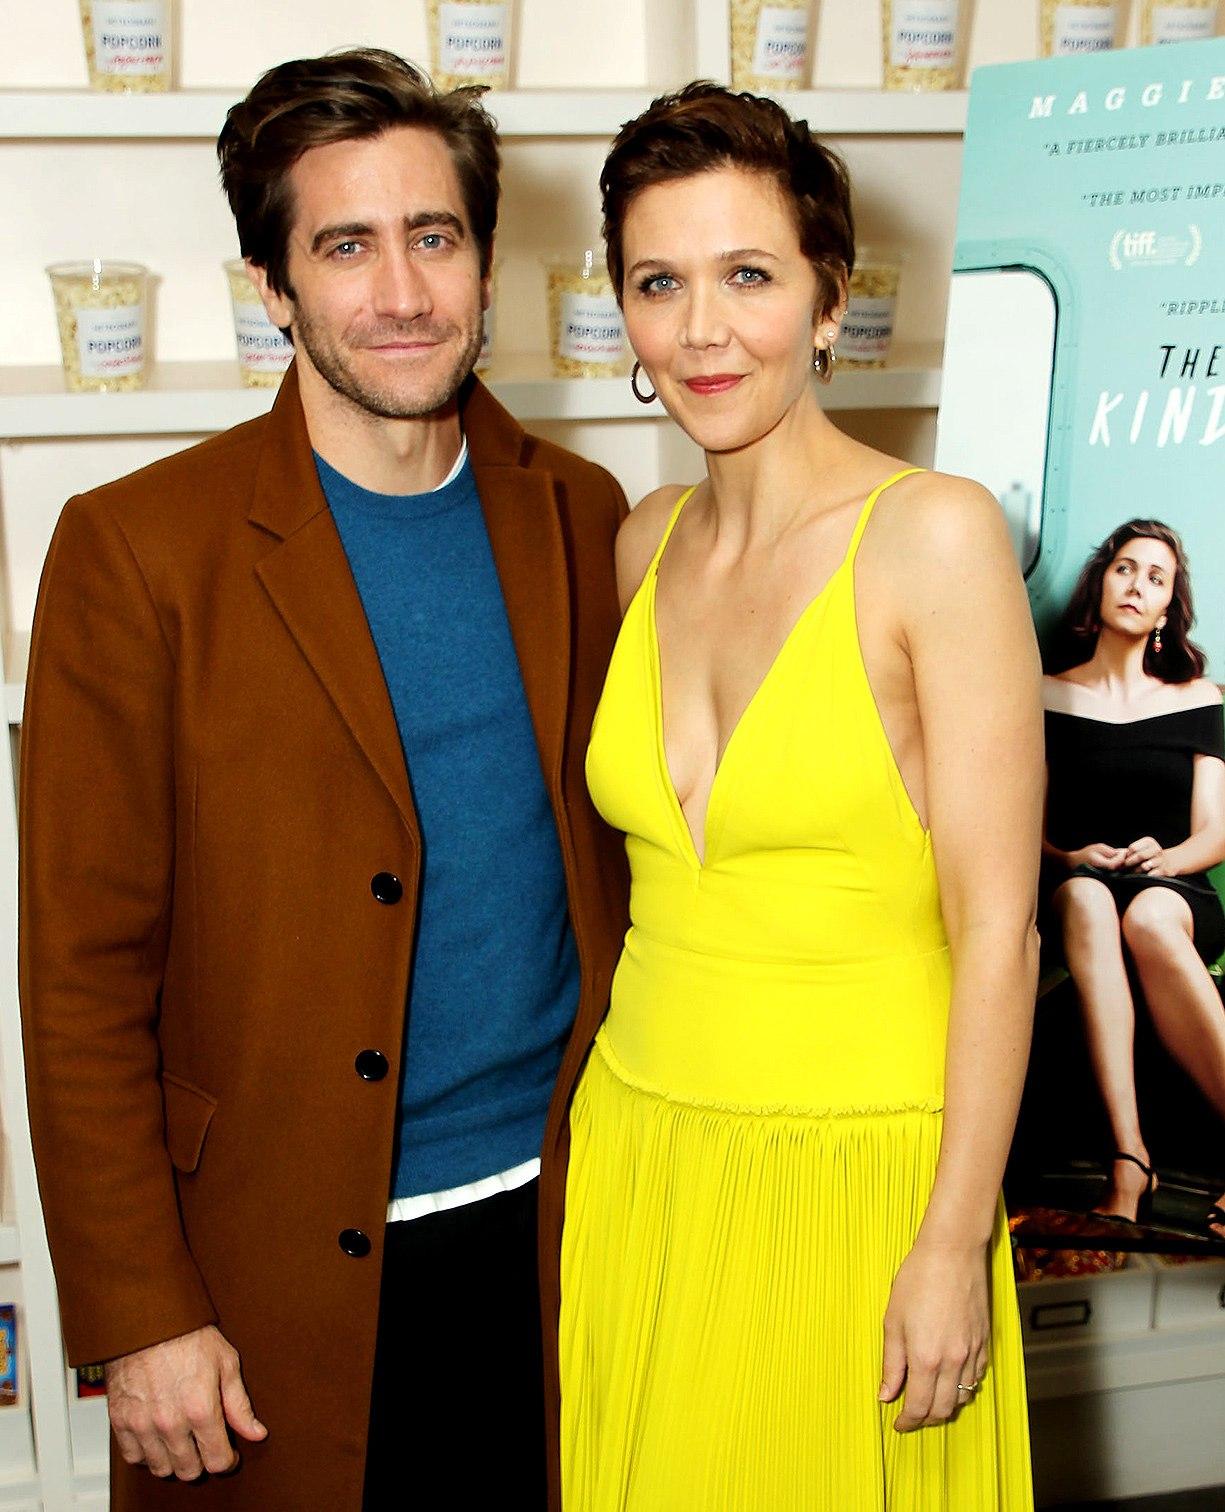 jake gyllenhaal3 10 Things You Didn't Know About Jake Gyllenhaal